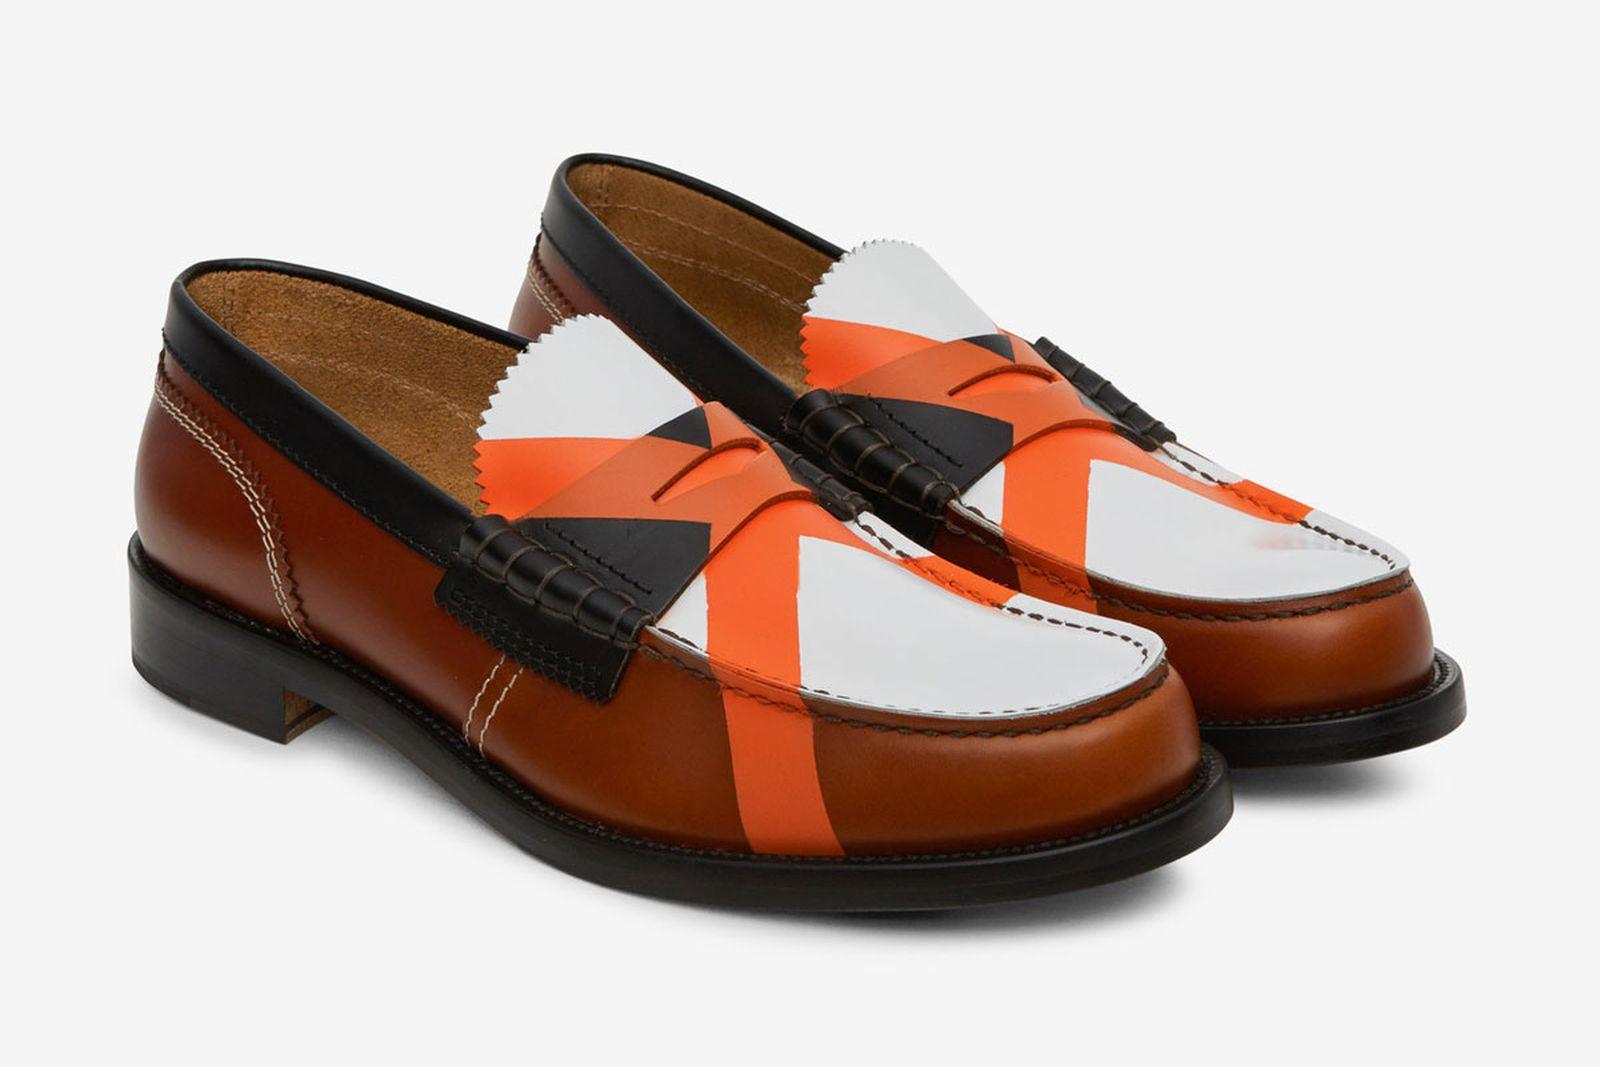 college antick loafers slamjam